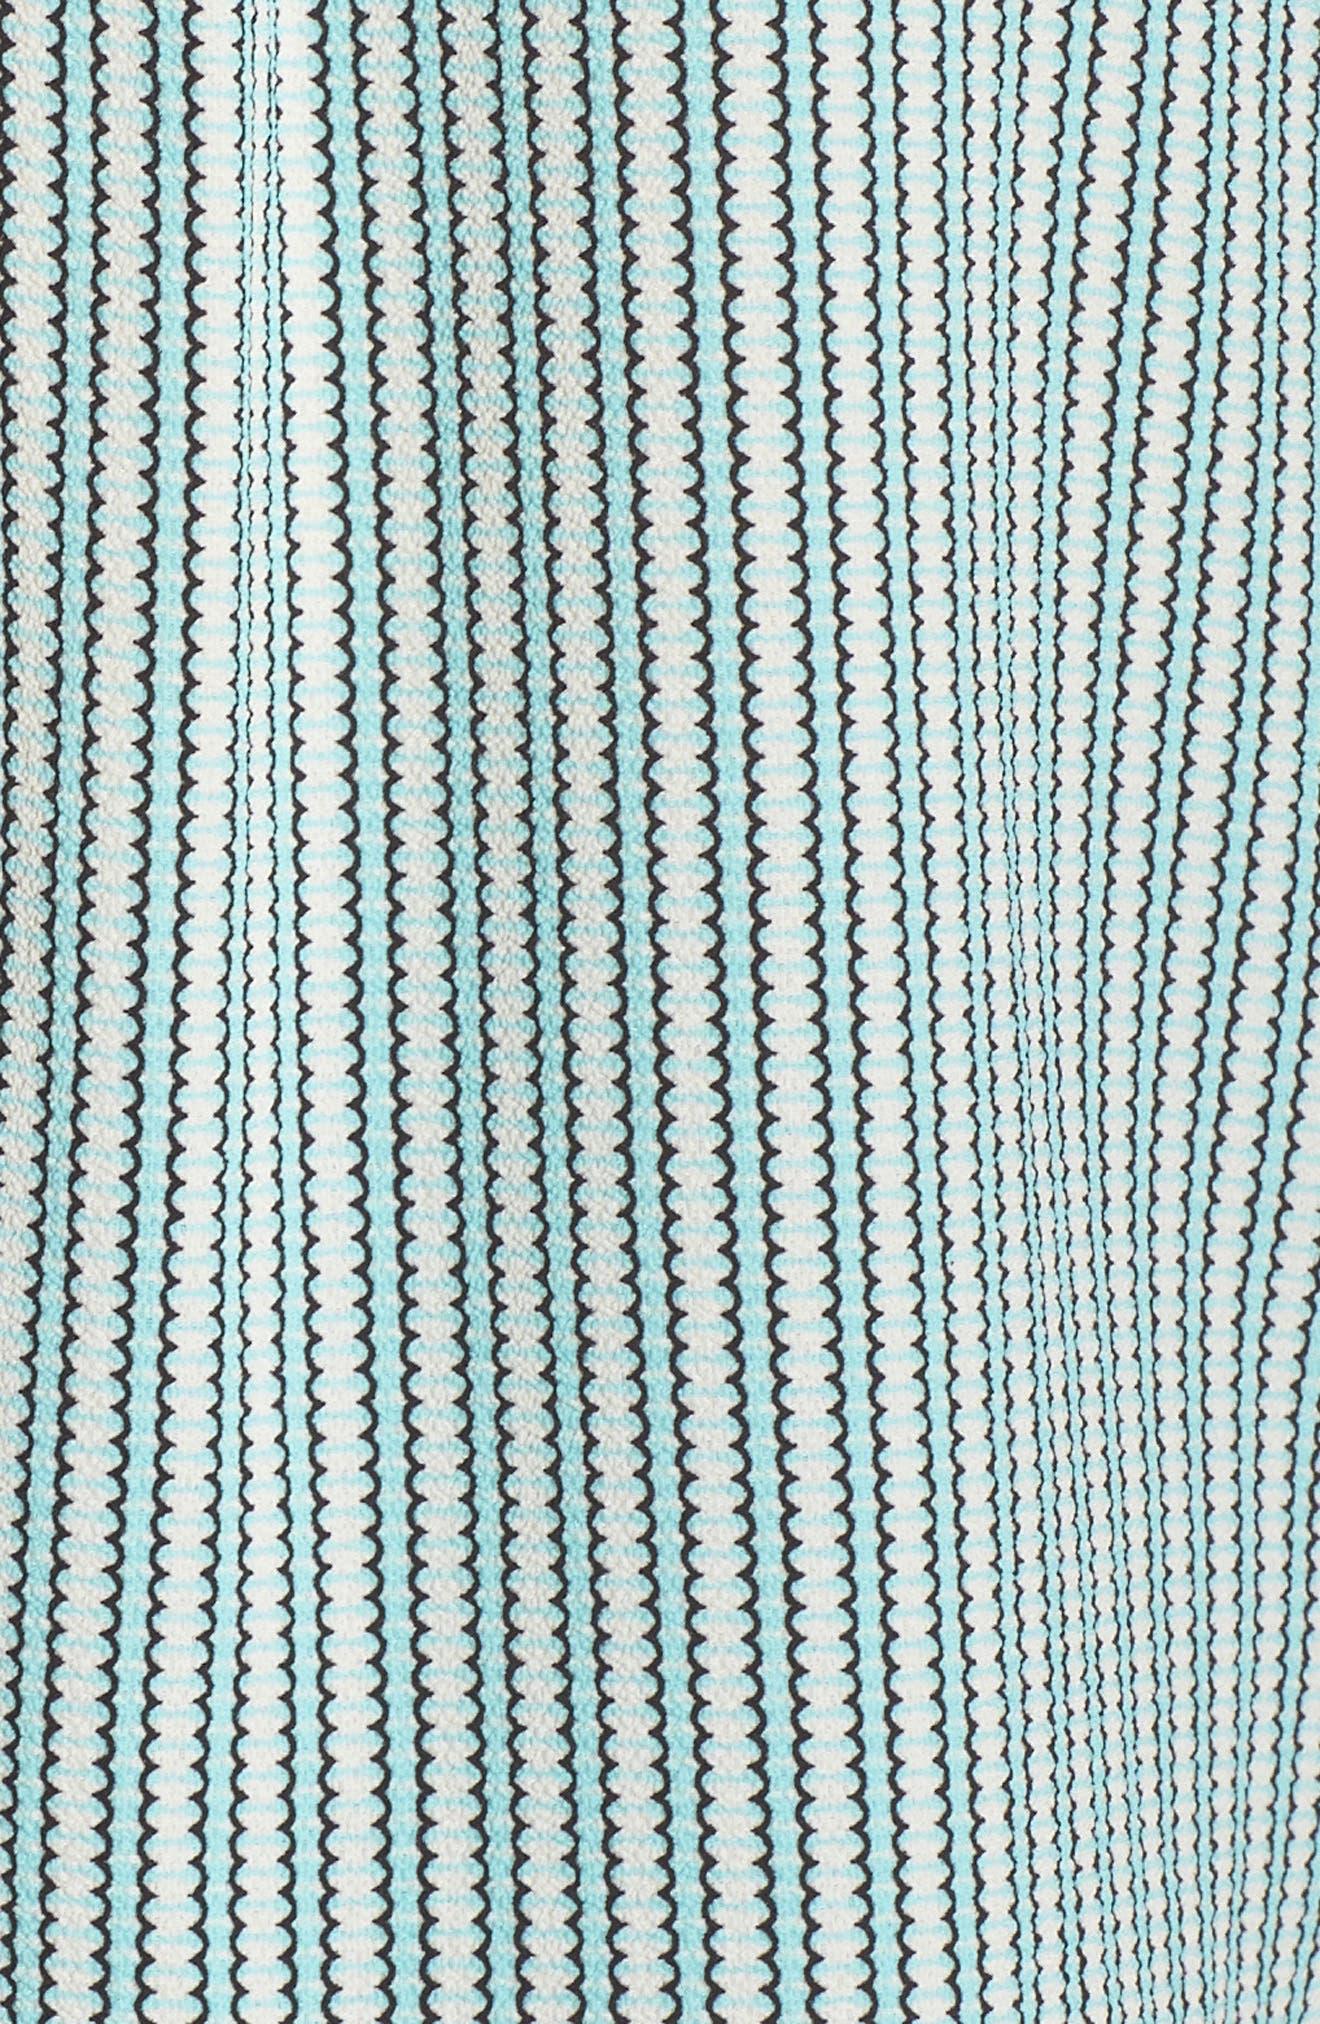 VINCE CAMUTO, Linear Motion Blouse, Alternate thumbnail 5, color, BRIGHT AQUA